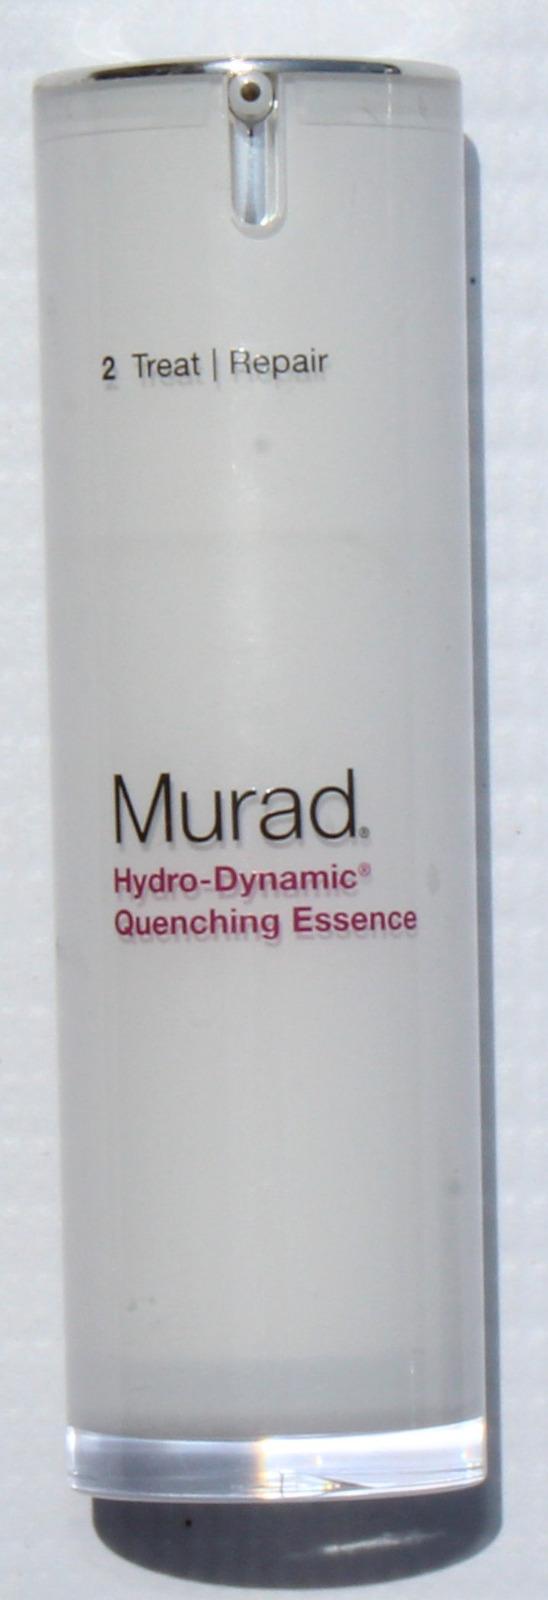 Hydro Dynamic Quenching Essence